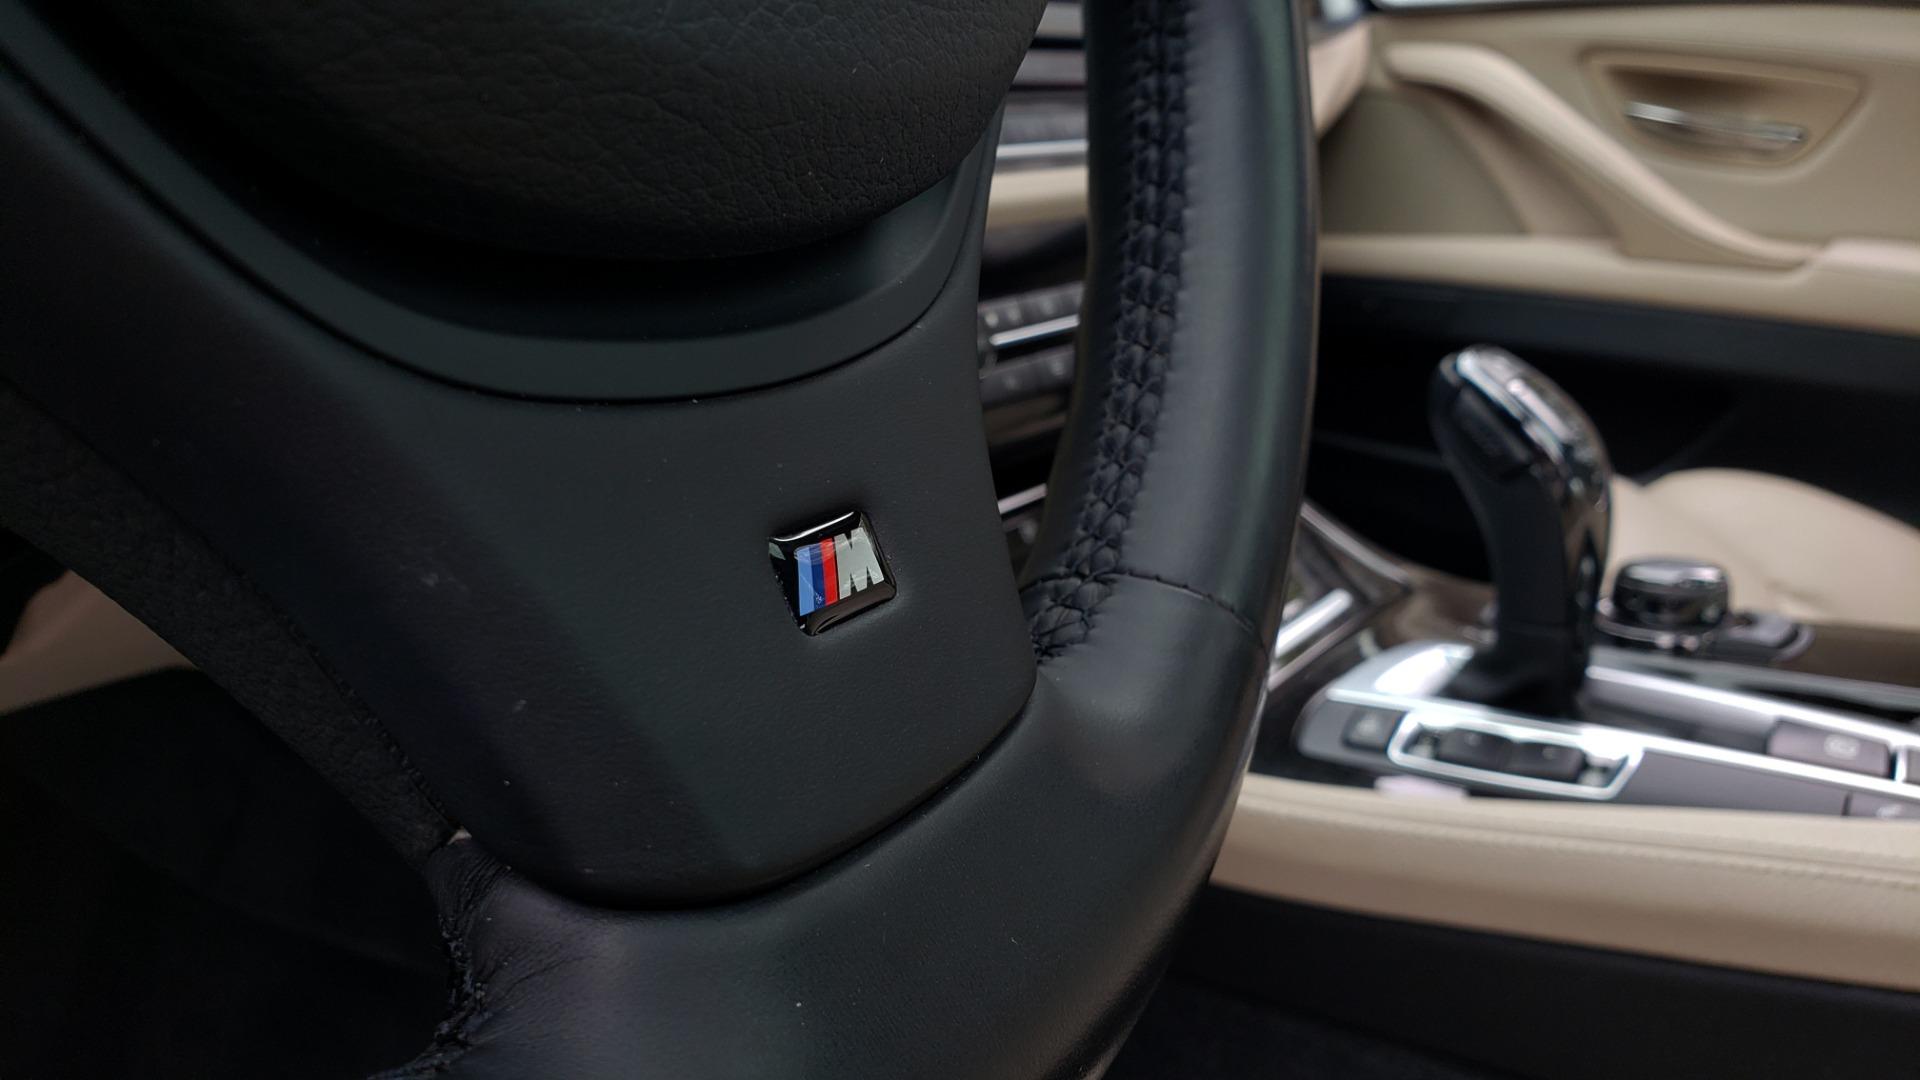 Used 2012 BMW 5 SERIES 550I M SPORT / NAV / CONV PKG / SUNROOF / PREM SND / REARVIEW for sale Sold at Formula Imports in Charlotte NC 28227 30